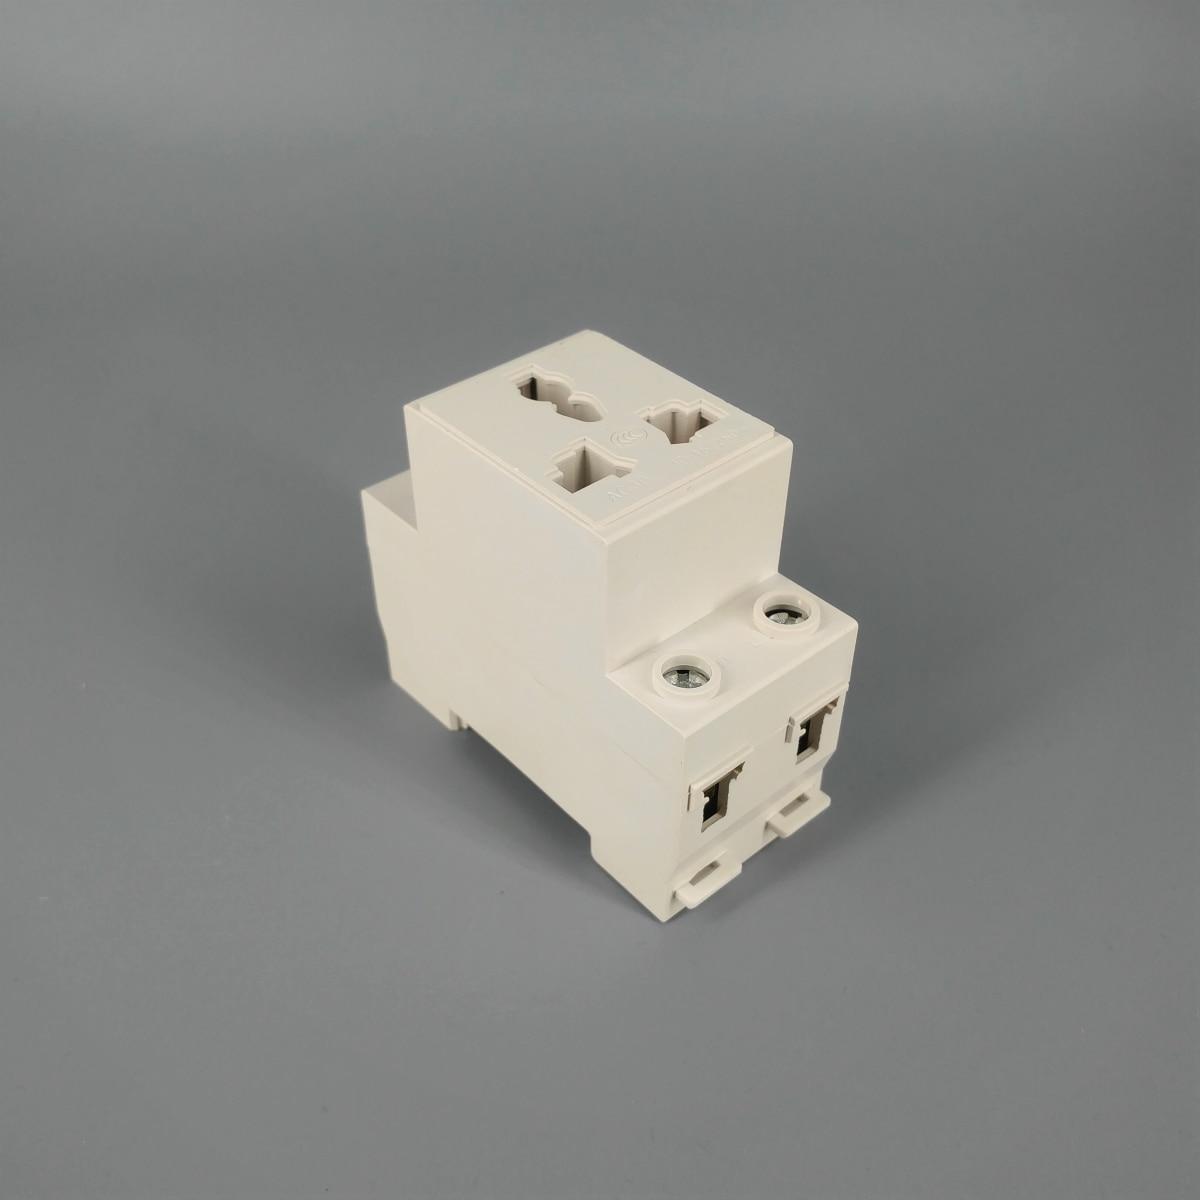 AC30  3 Pin Plug 35mm Din Rail Mount Modular socket 10-16A 250V